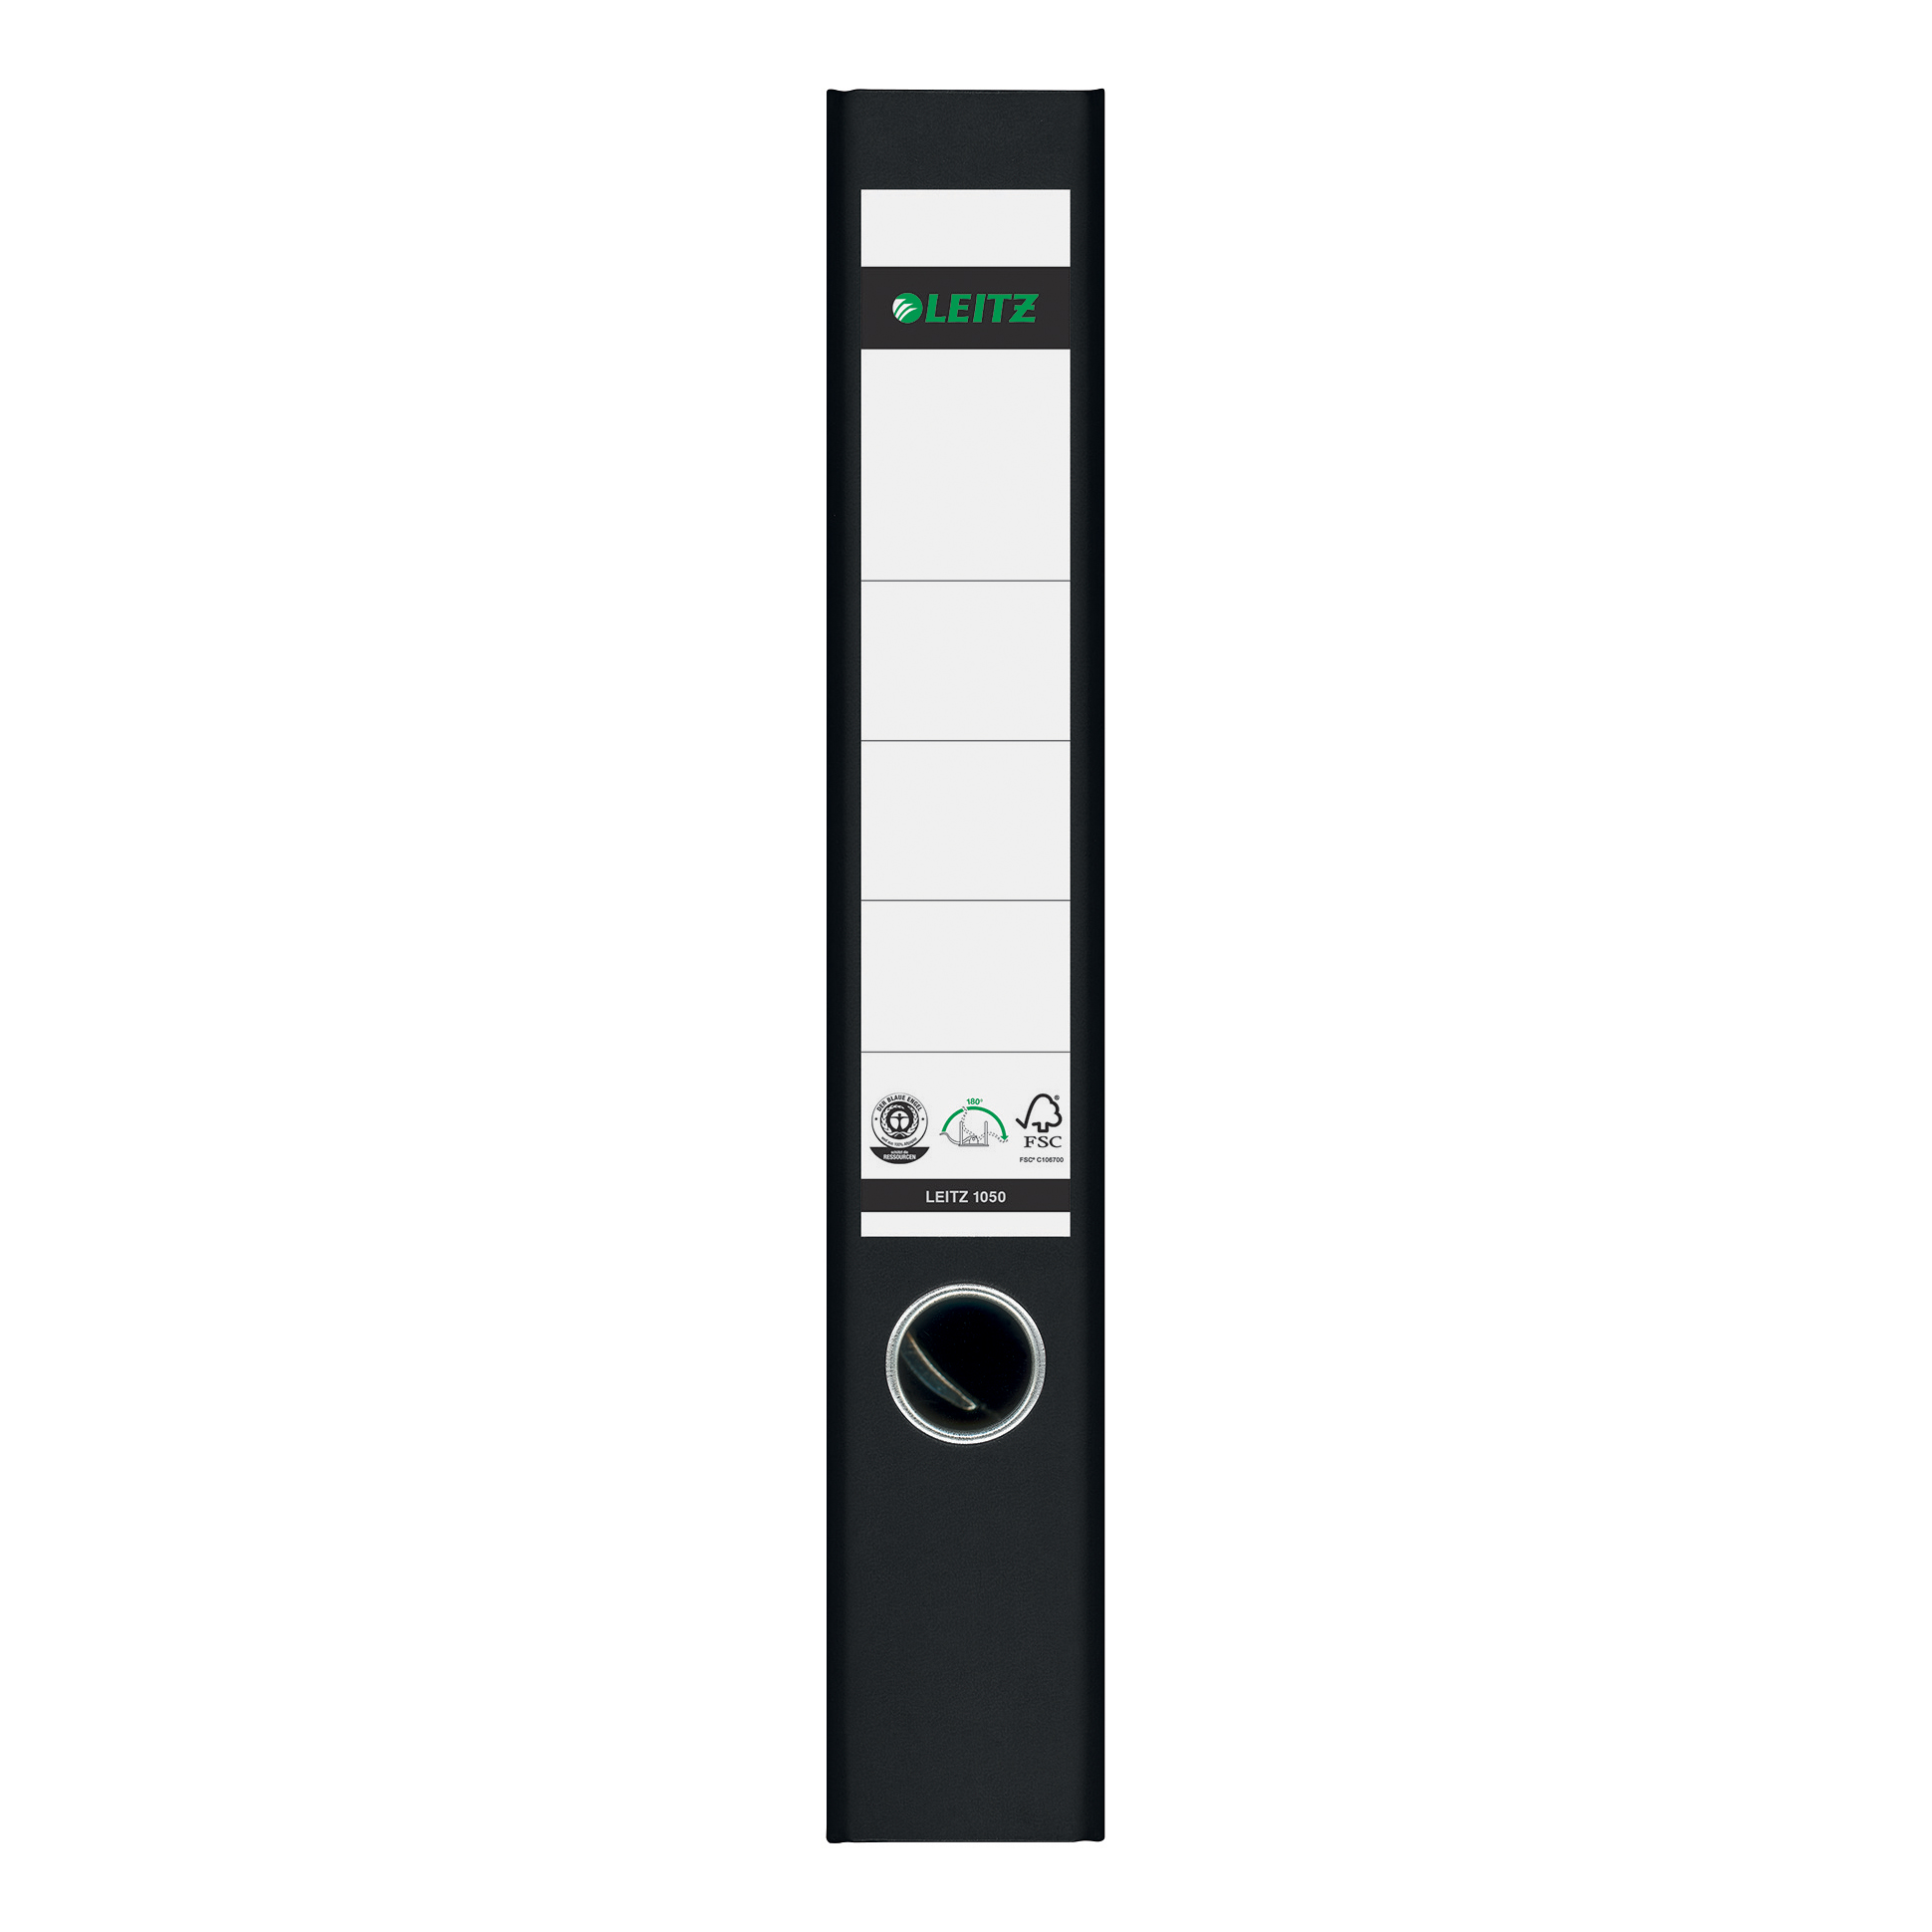 Leitz FSC Standard Mini Lever Arch File 52mm Spine A4 Black Ref 10501095 [Pack 10]